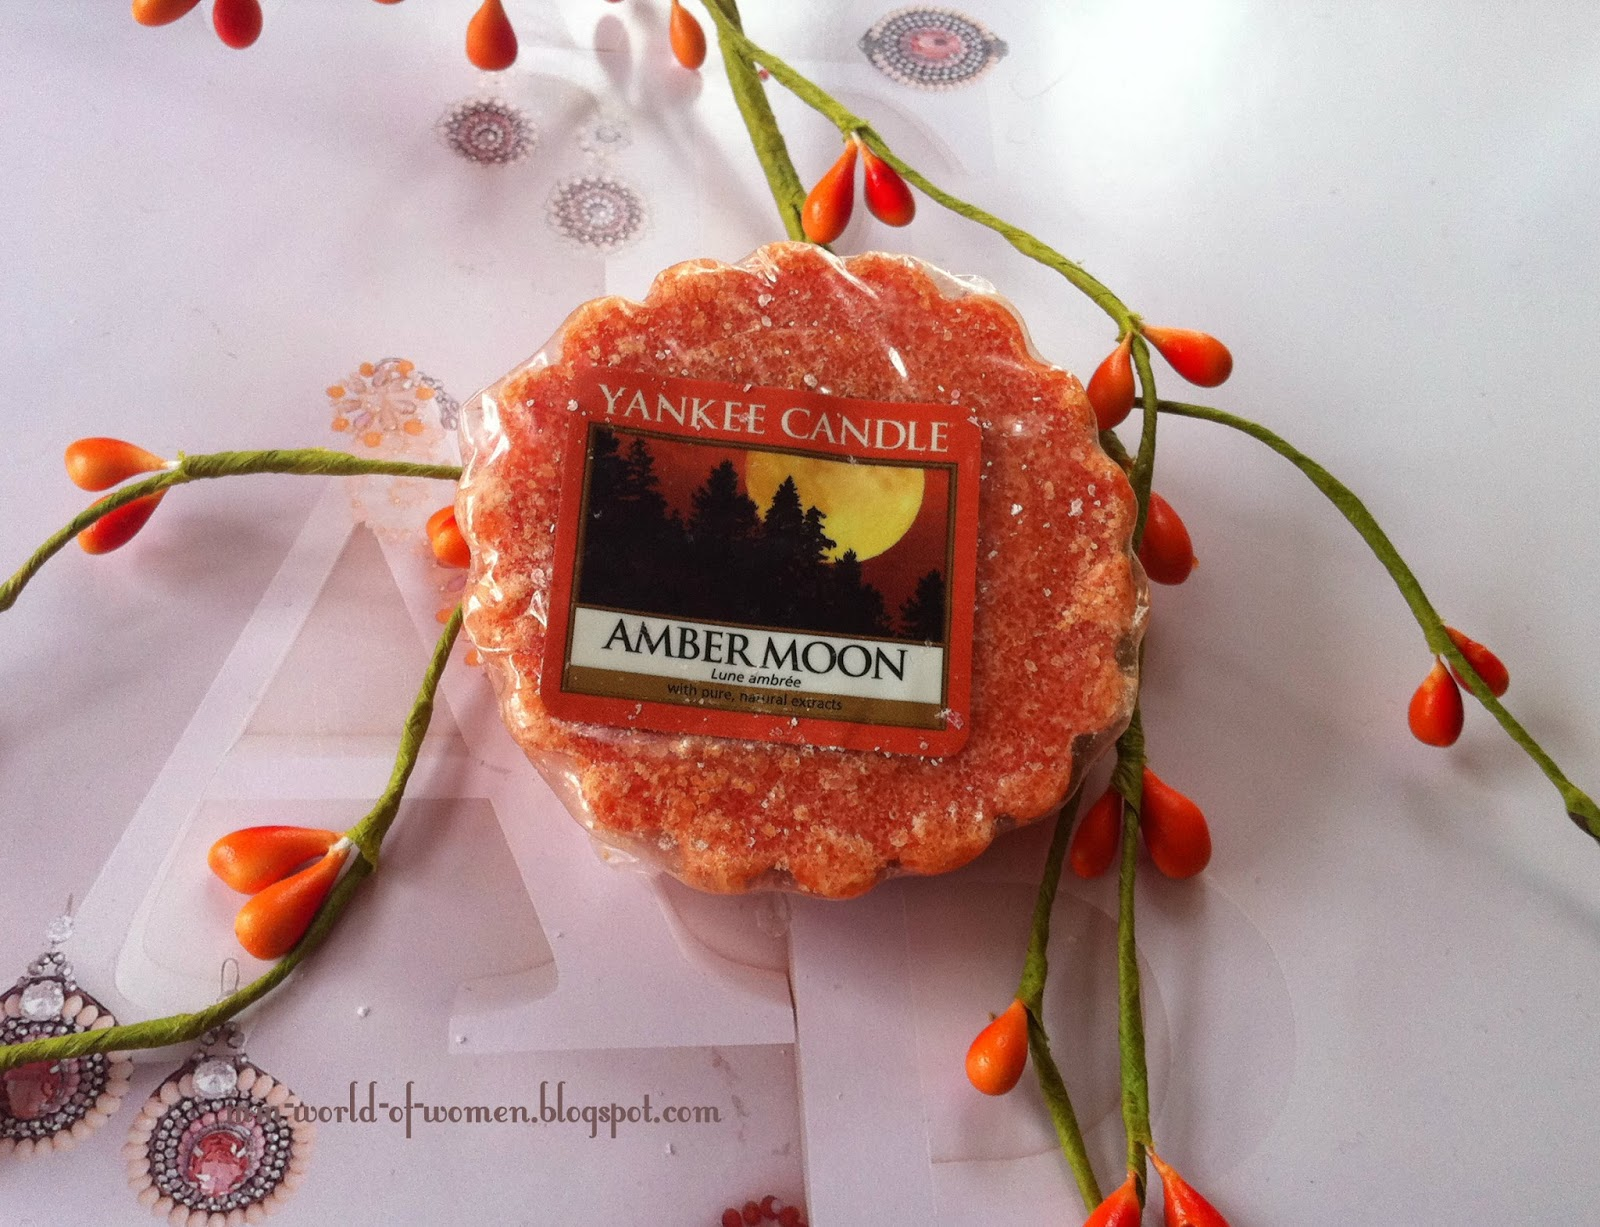 Amber Moon od Yankee Candle